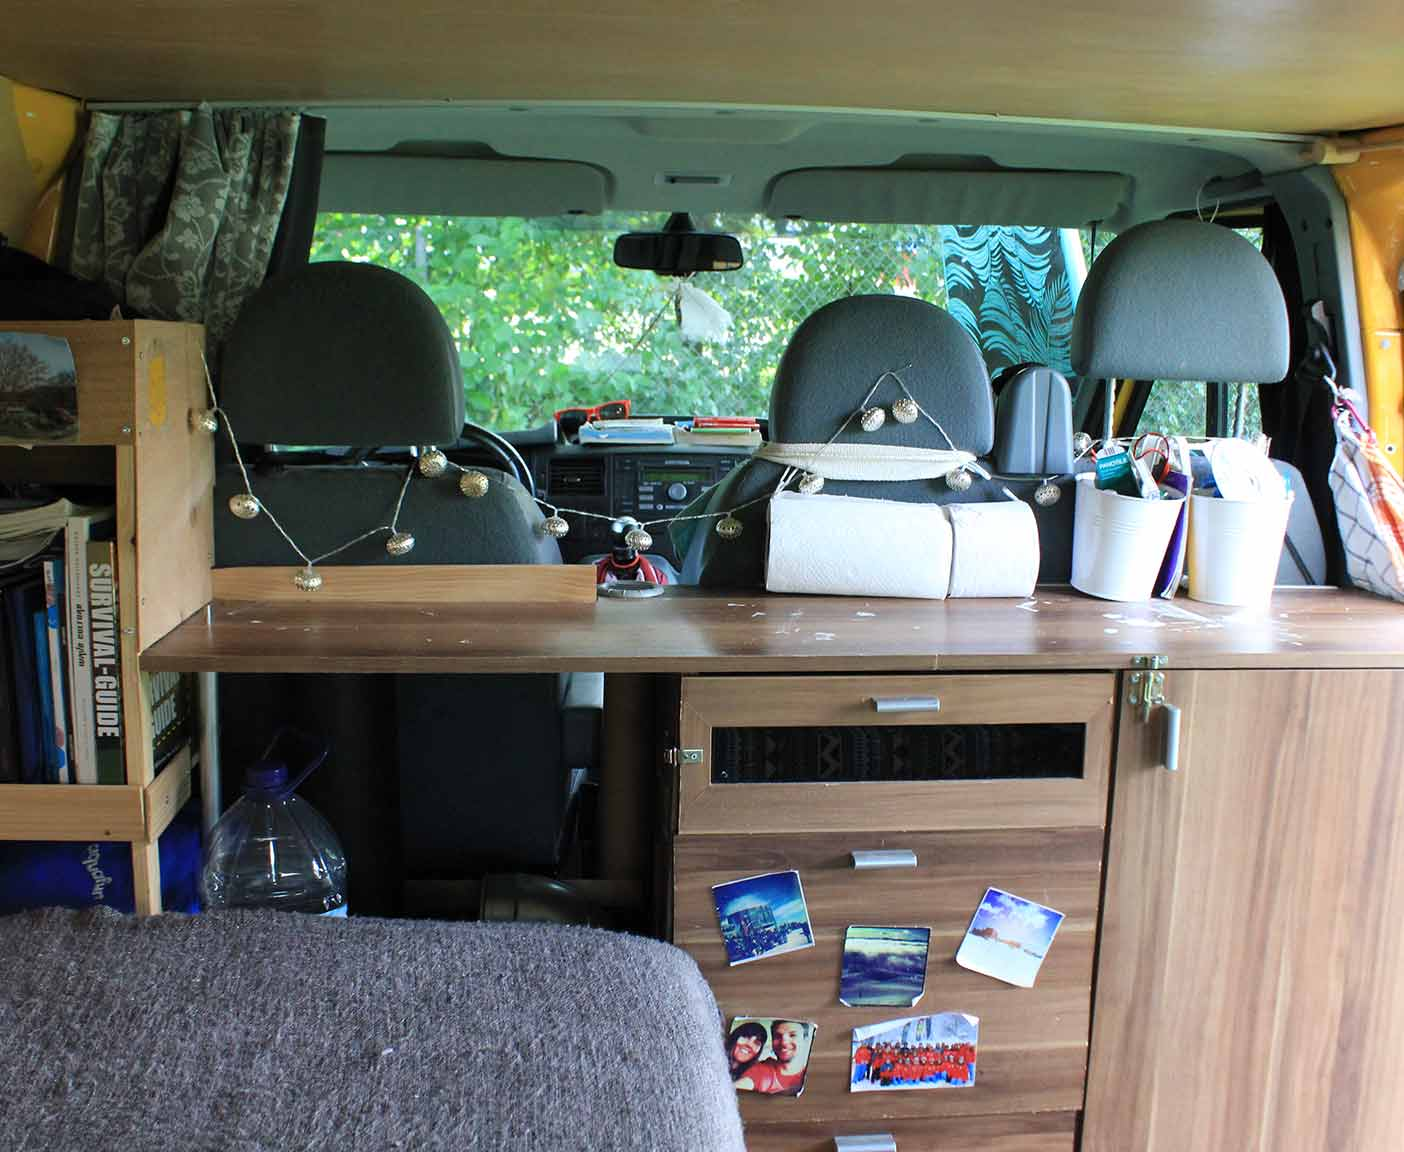 Ford-transit-kastenwagen-van-camper-vanlife-gebraucht